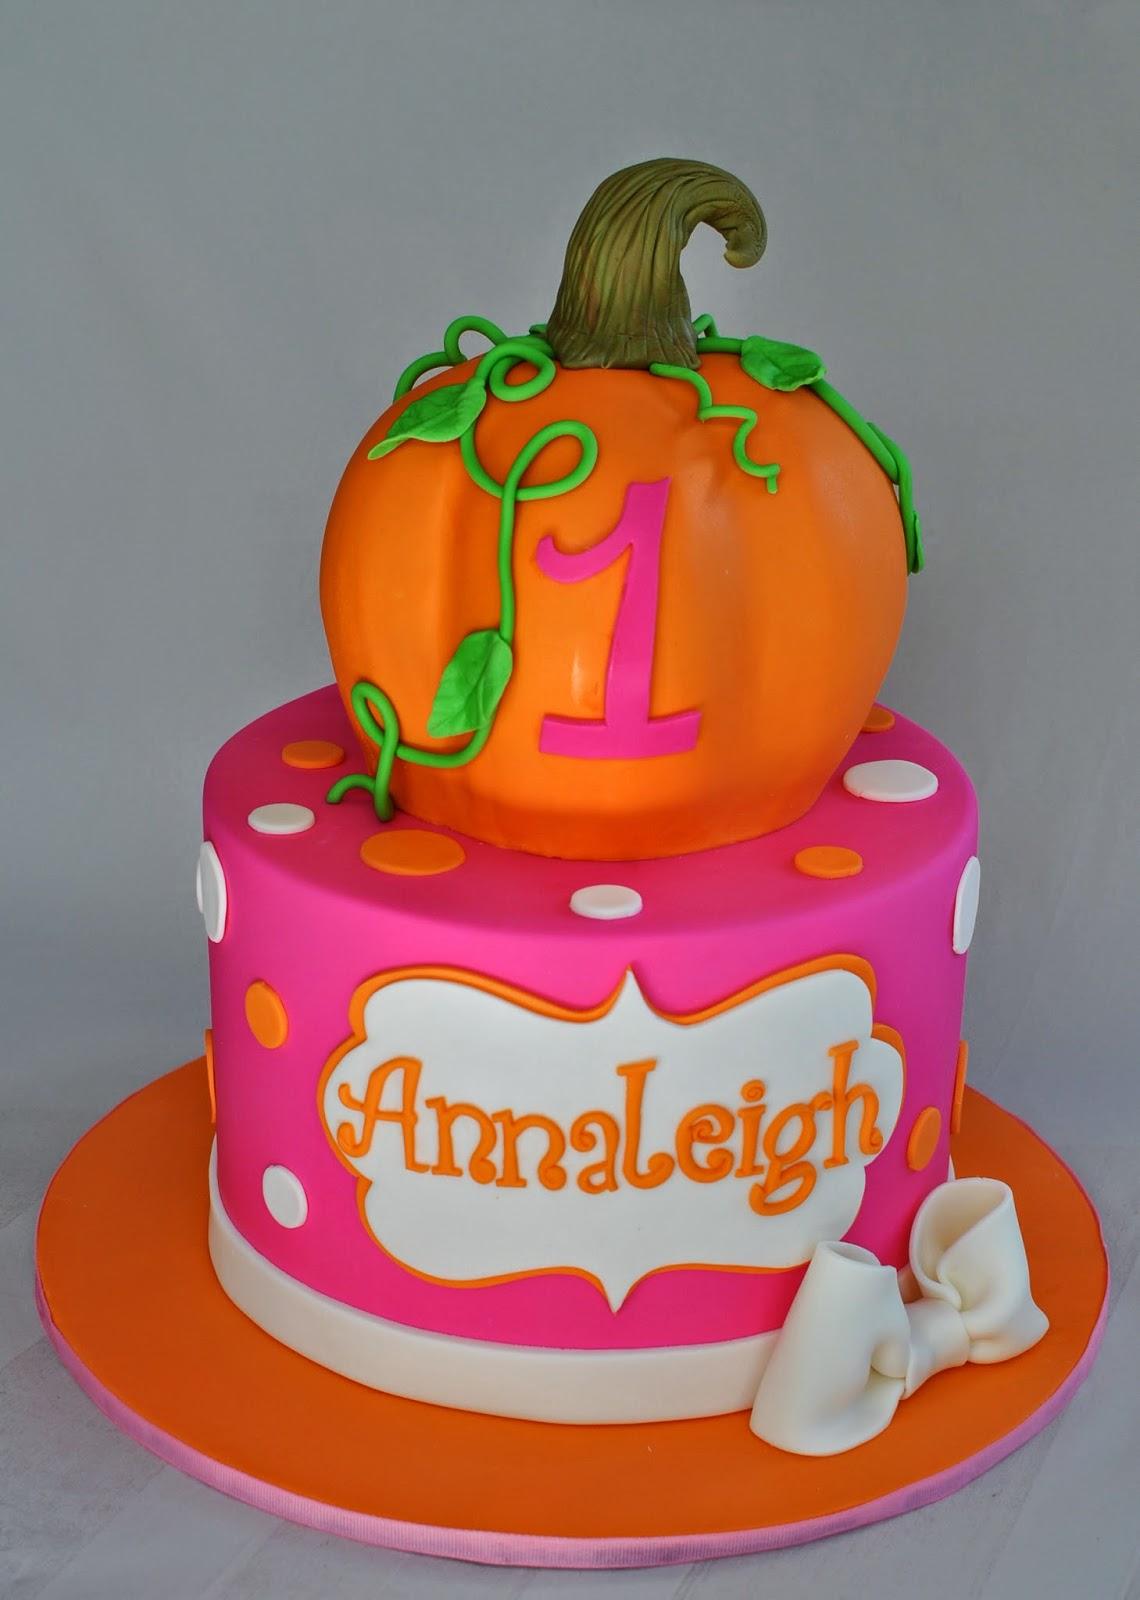 How To Make A Pumpkin Shaped Birthday Cake